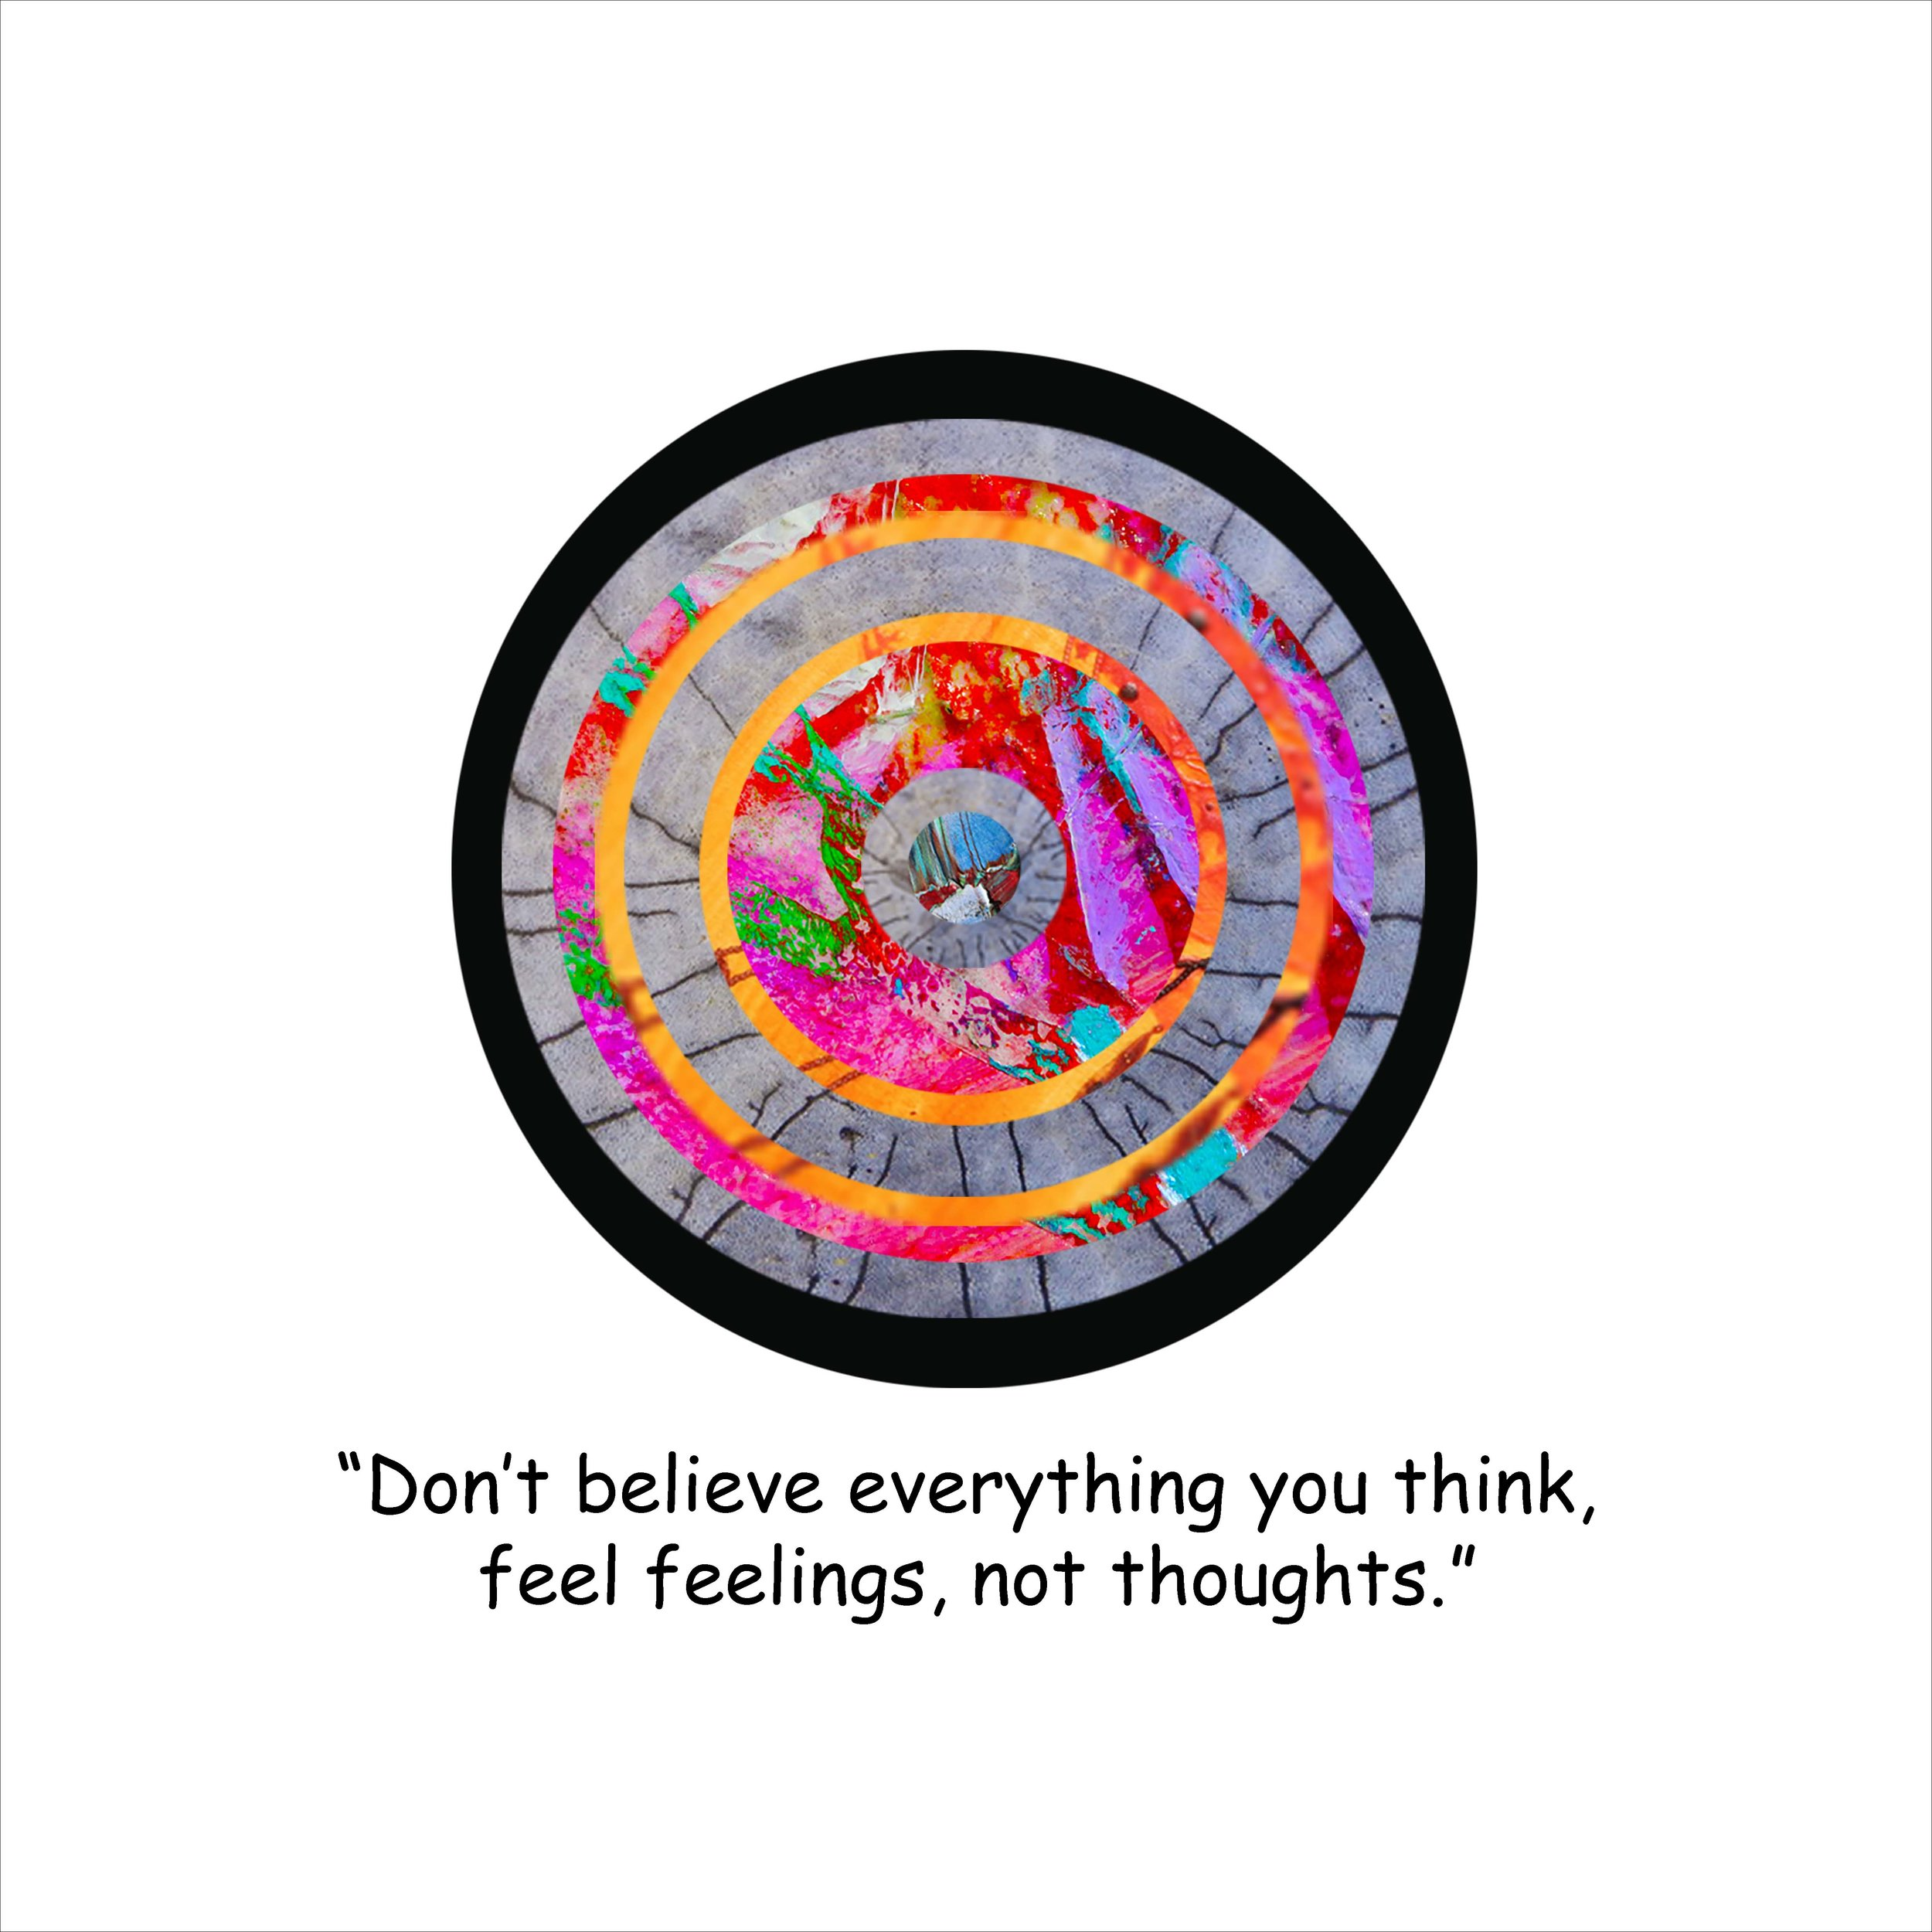 Don'tBelieveThink_10x10_gw.jpg